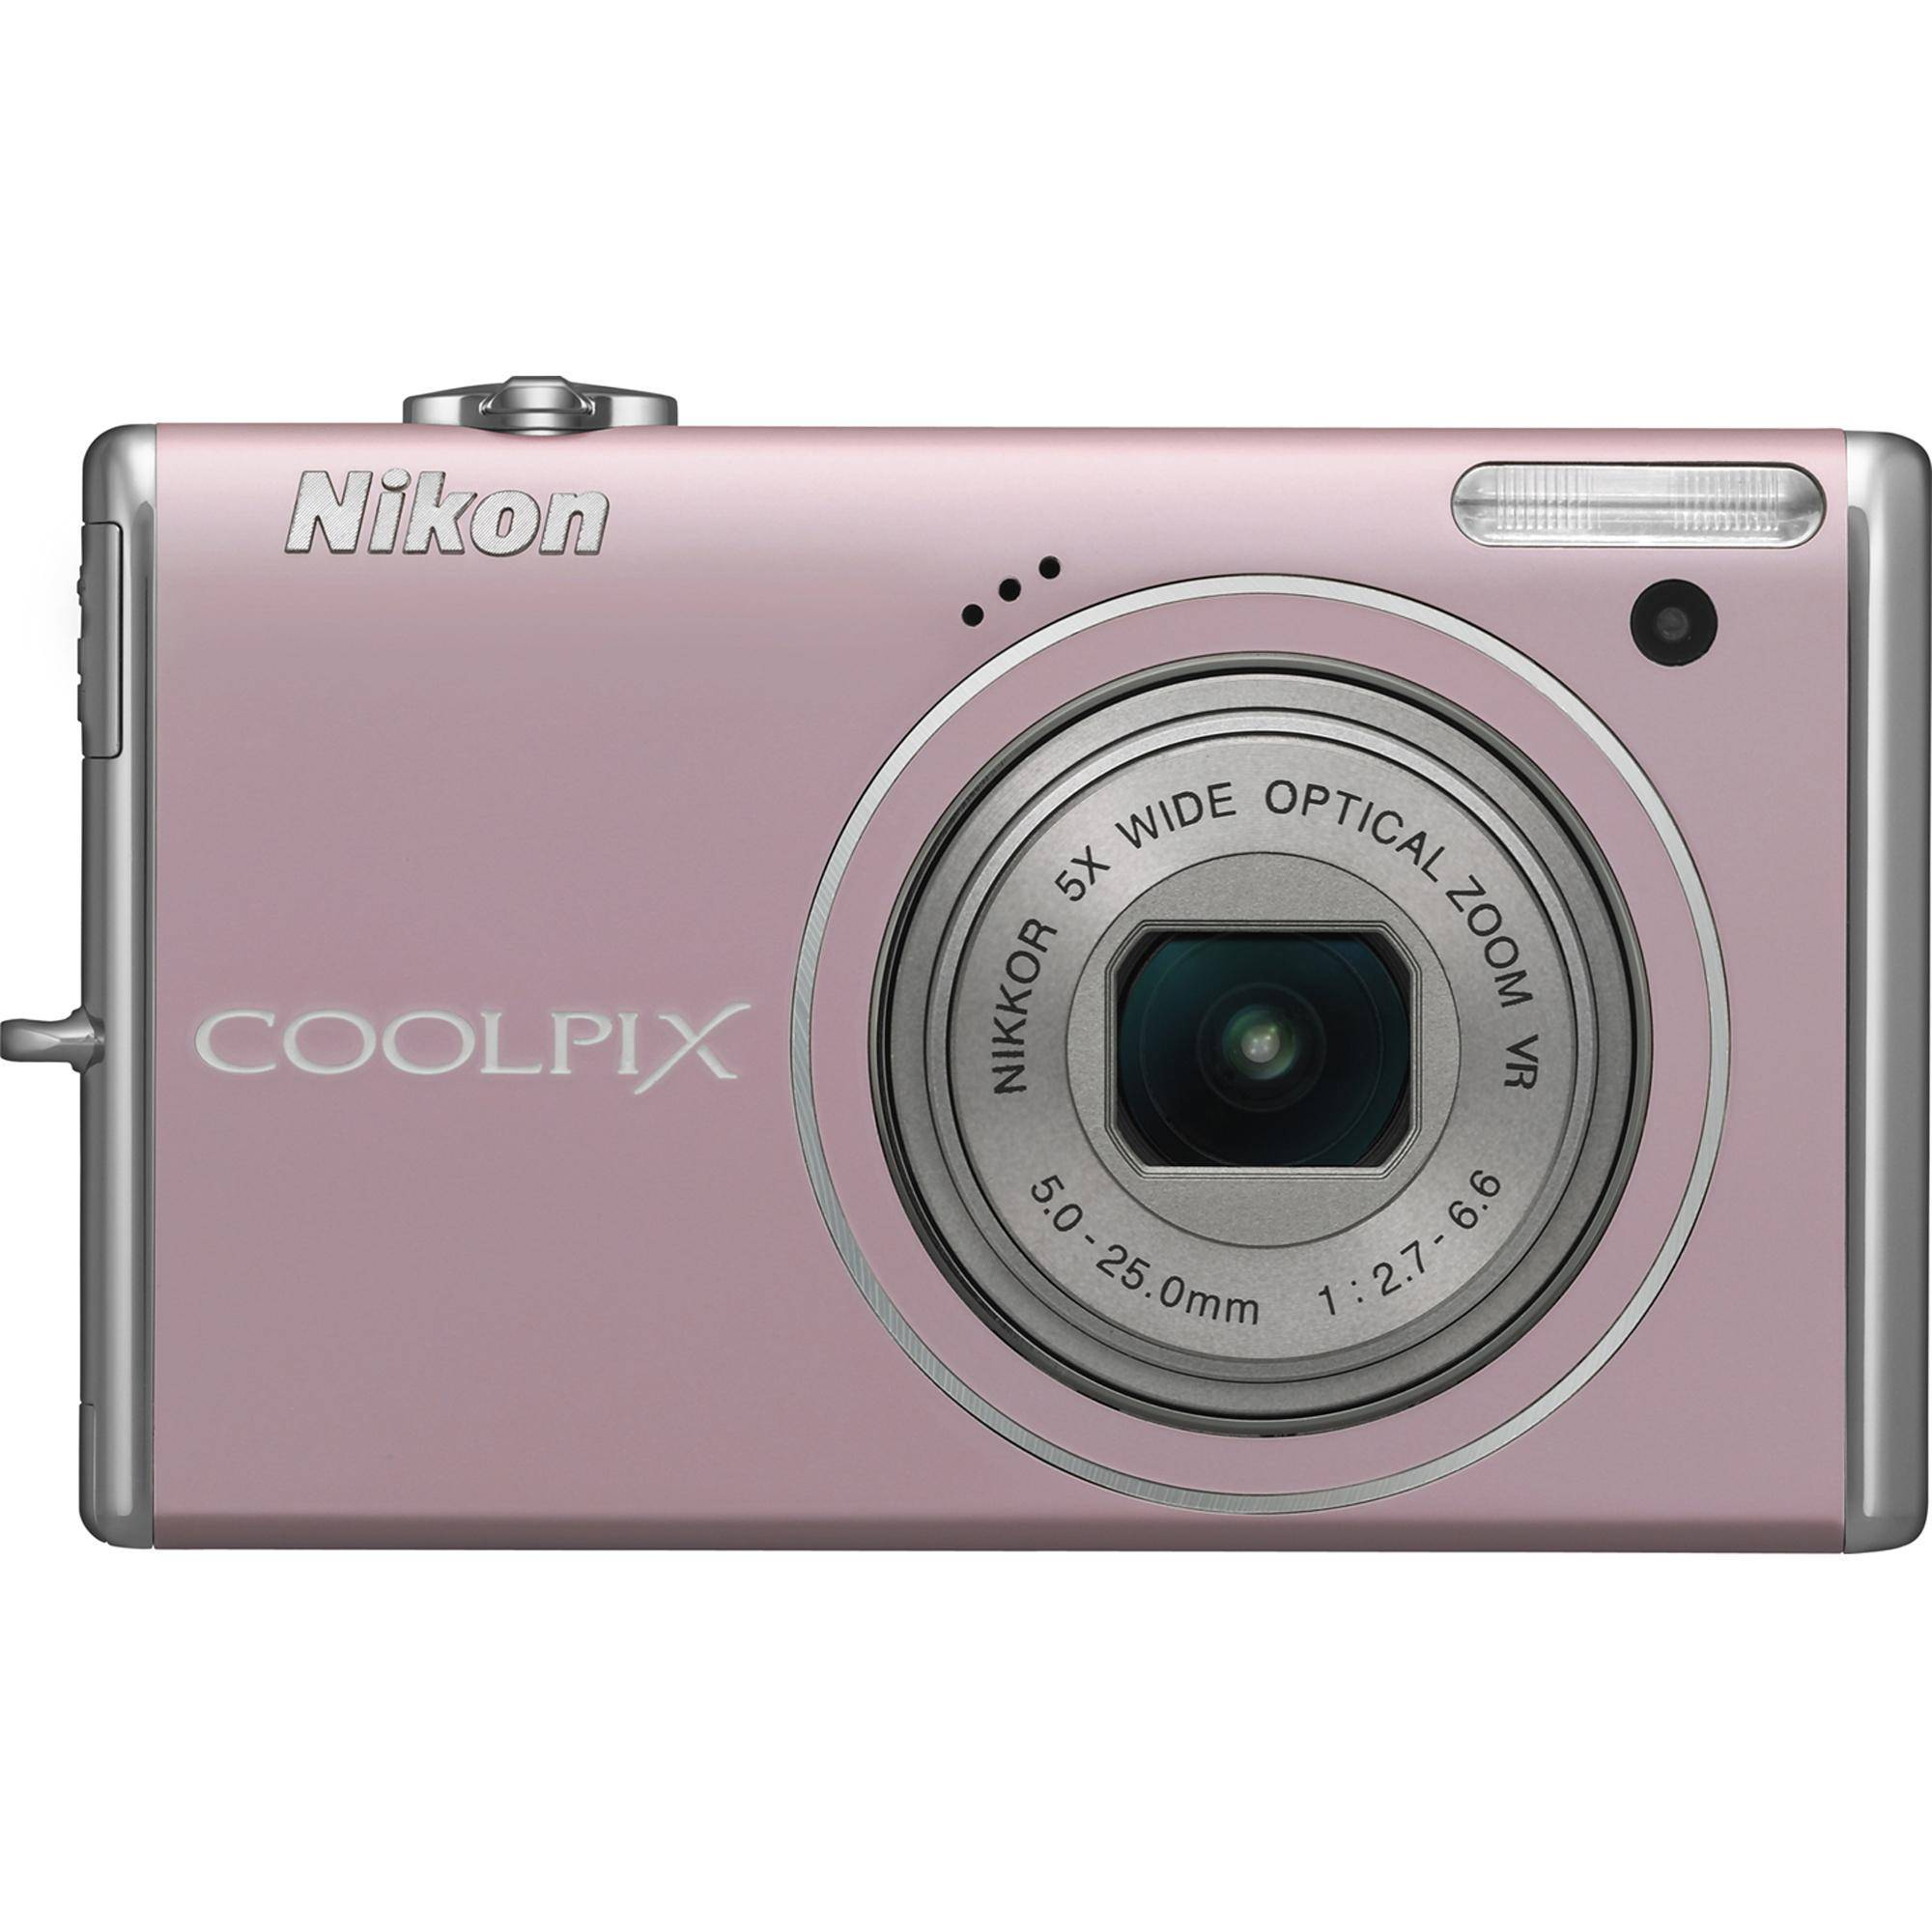 Nikon CoolPix S640 Digital Camera (Pink) 26185 B&H Photo Video